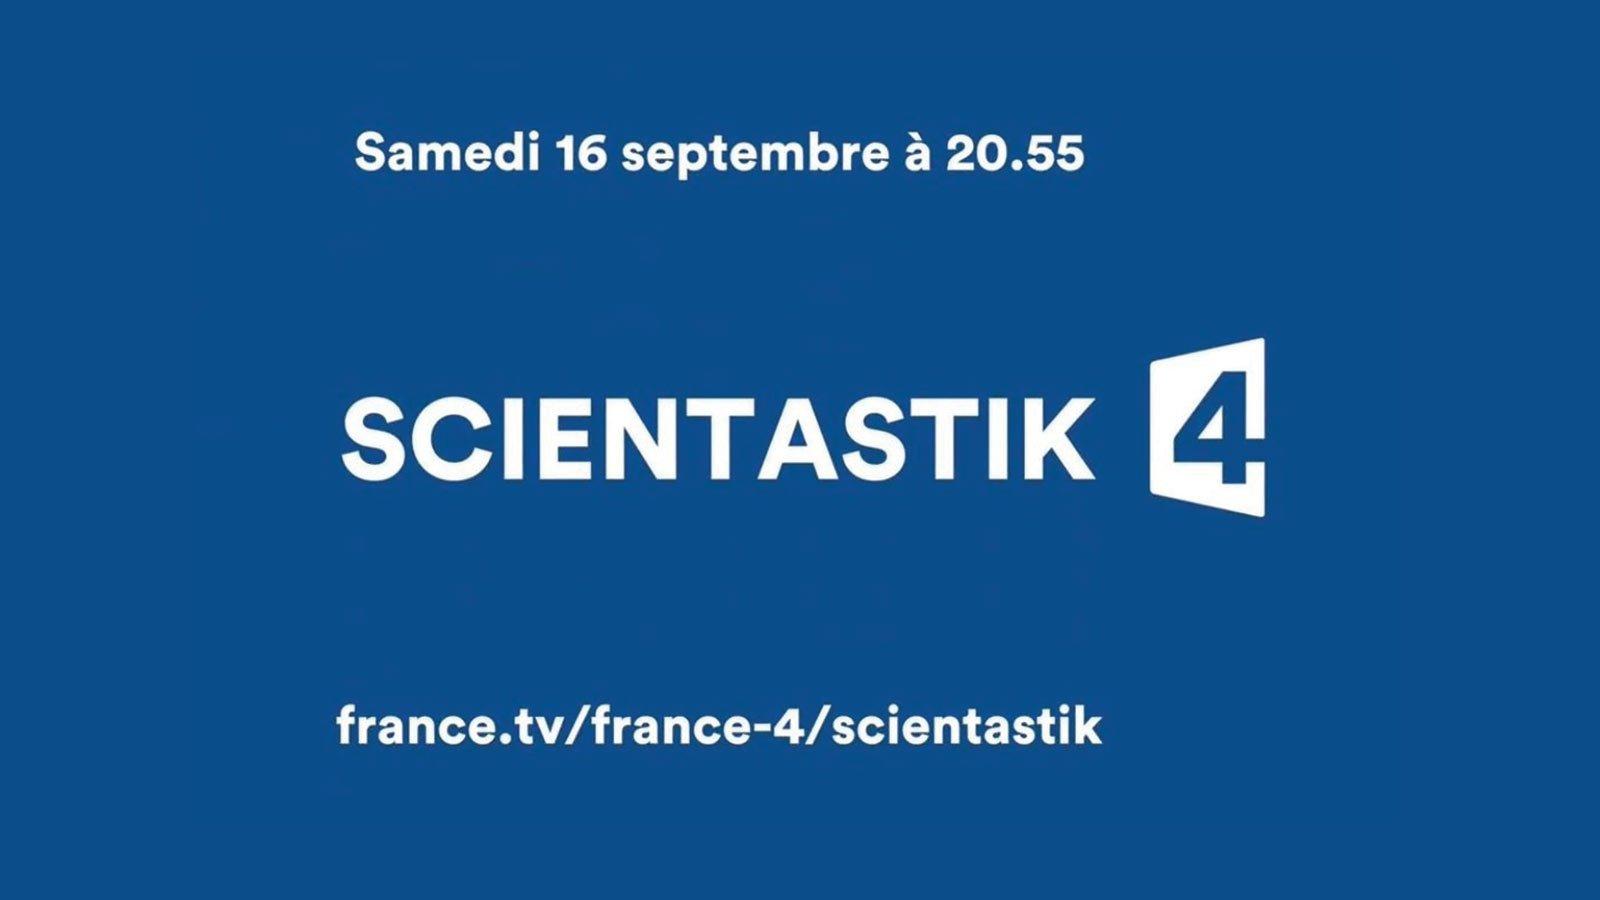 scientastik 4 use reality virtual studio